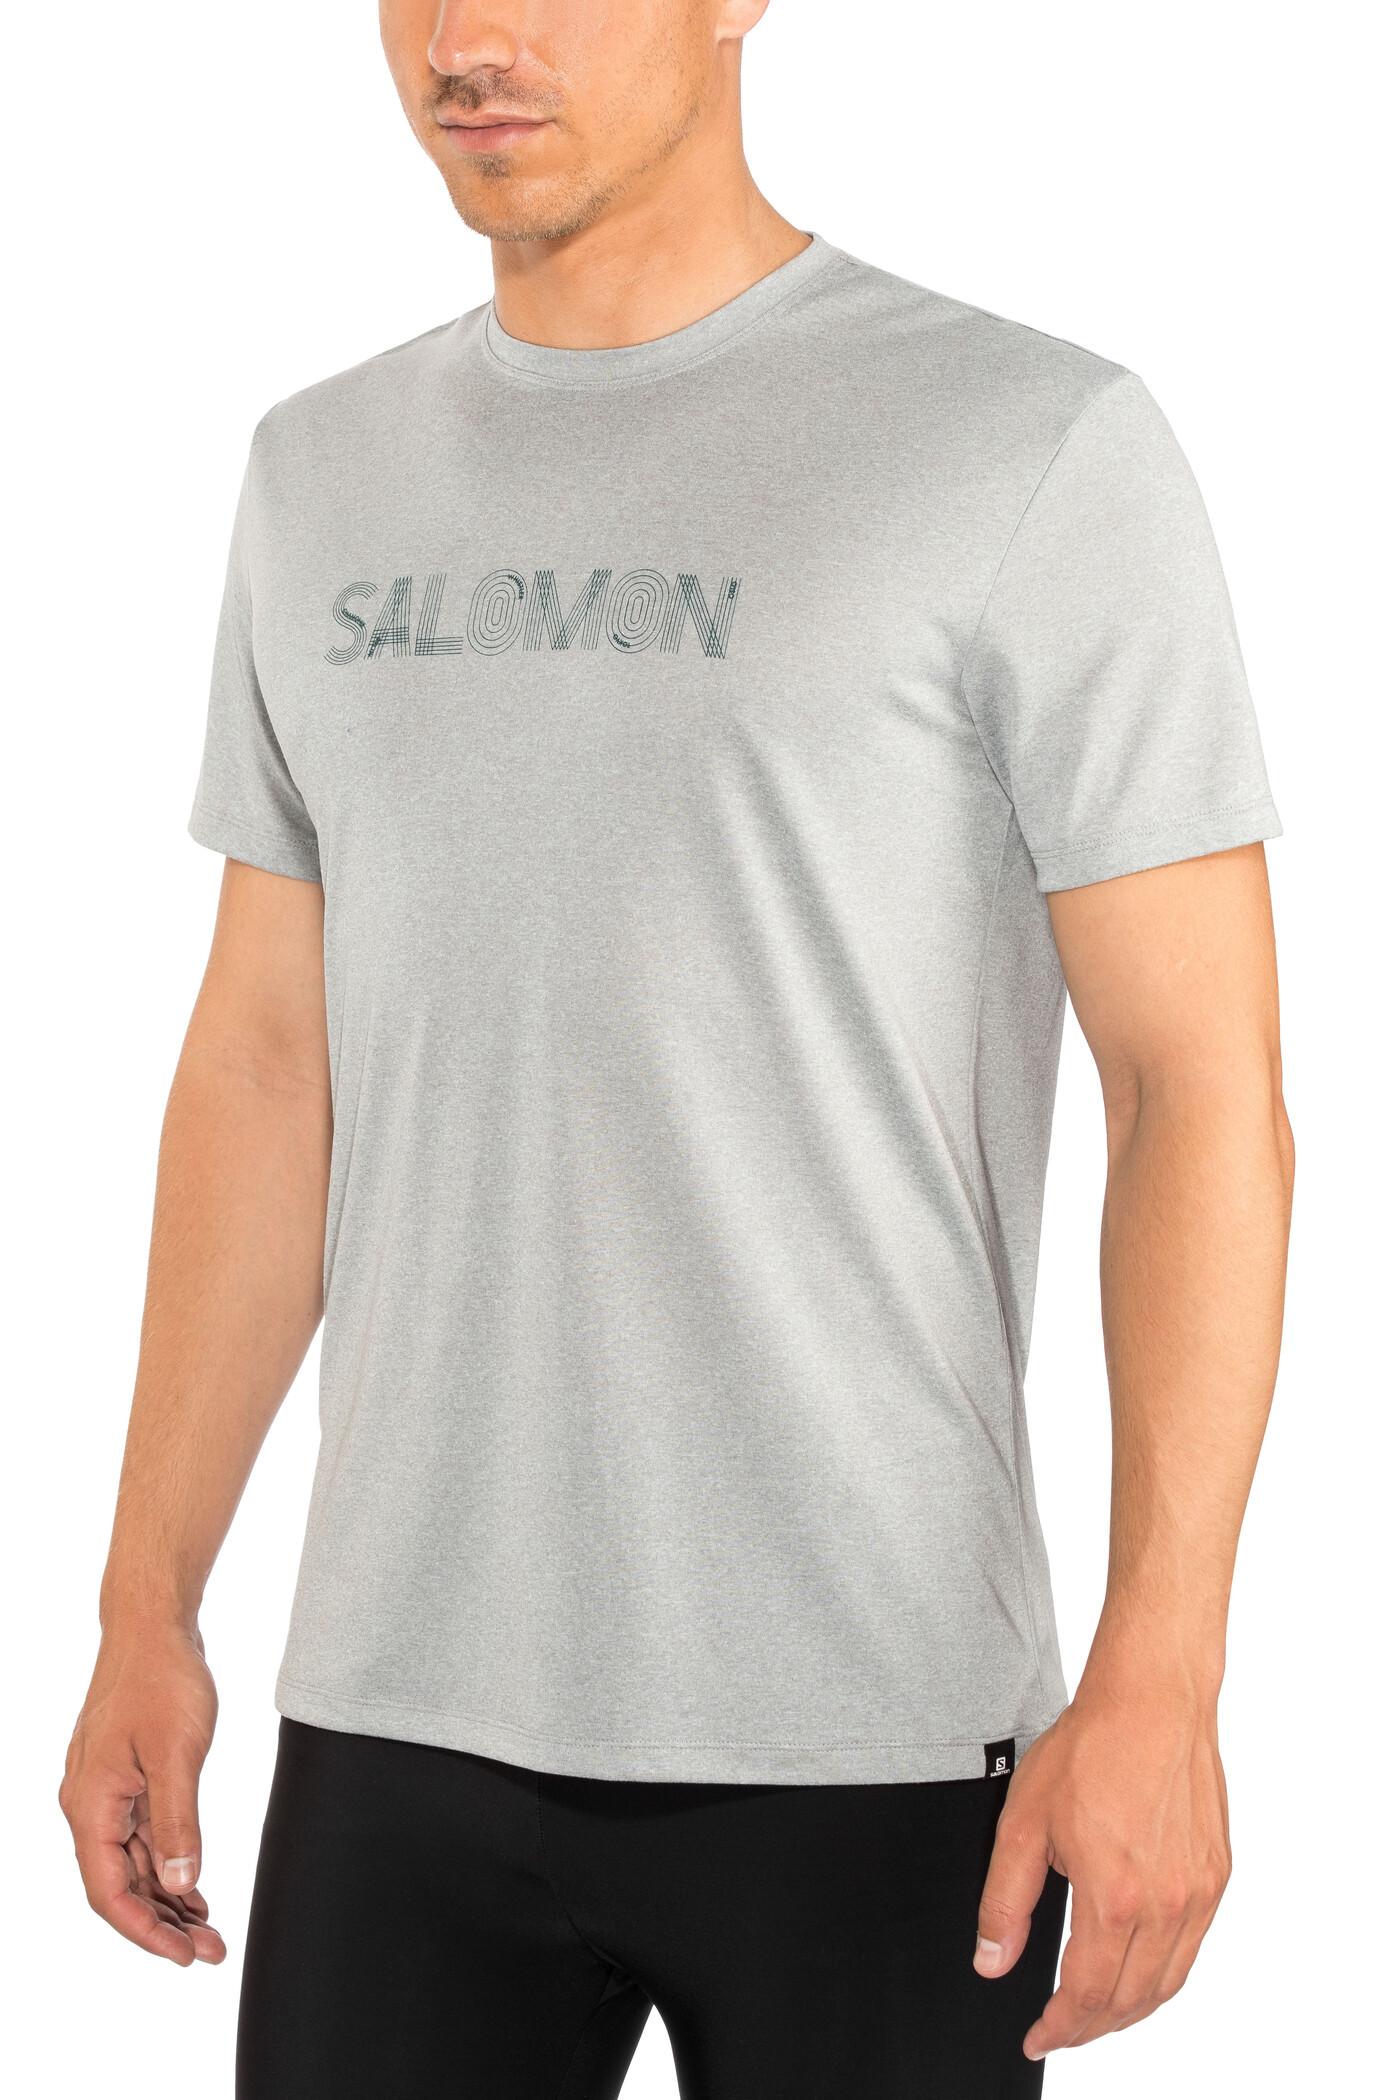 11 DEGREES PANEL BLOCK - T-shirts print - black/anthracite marl/white